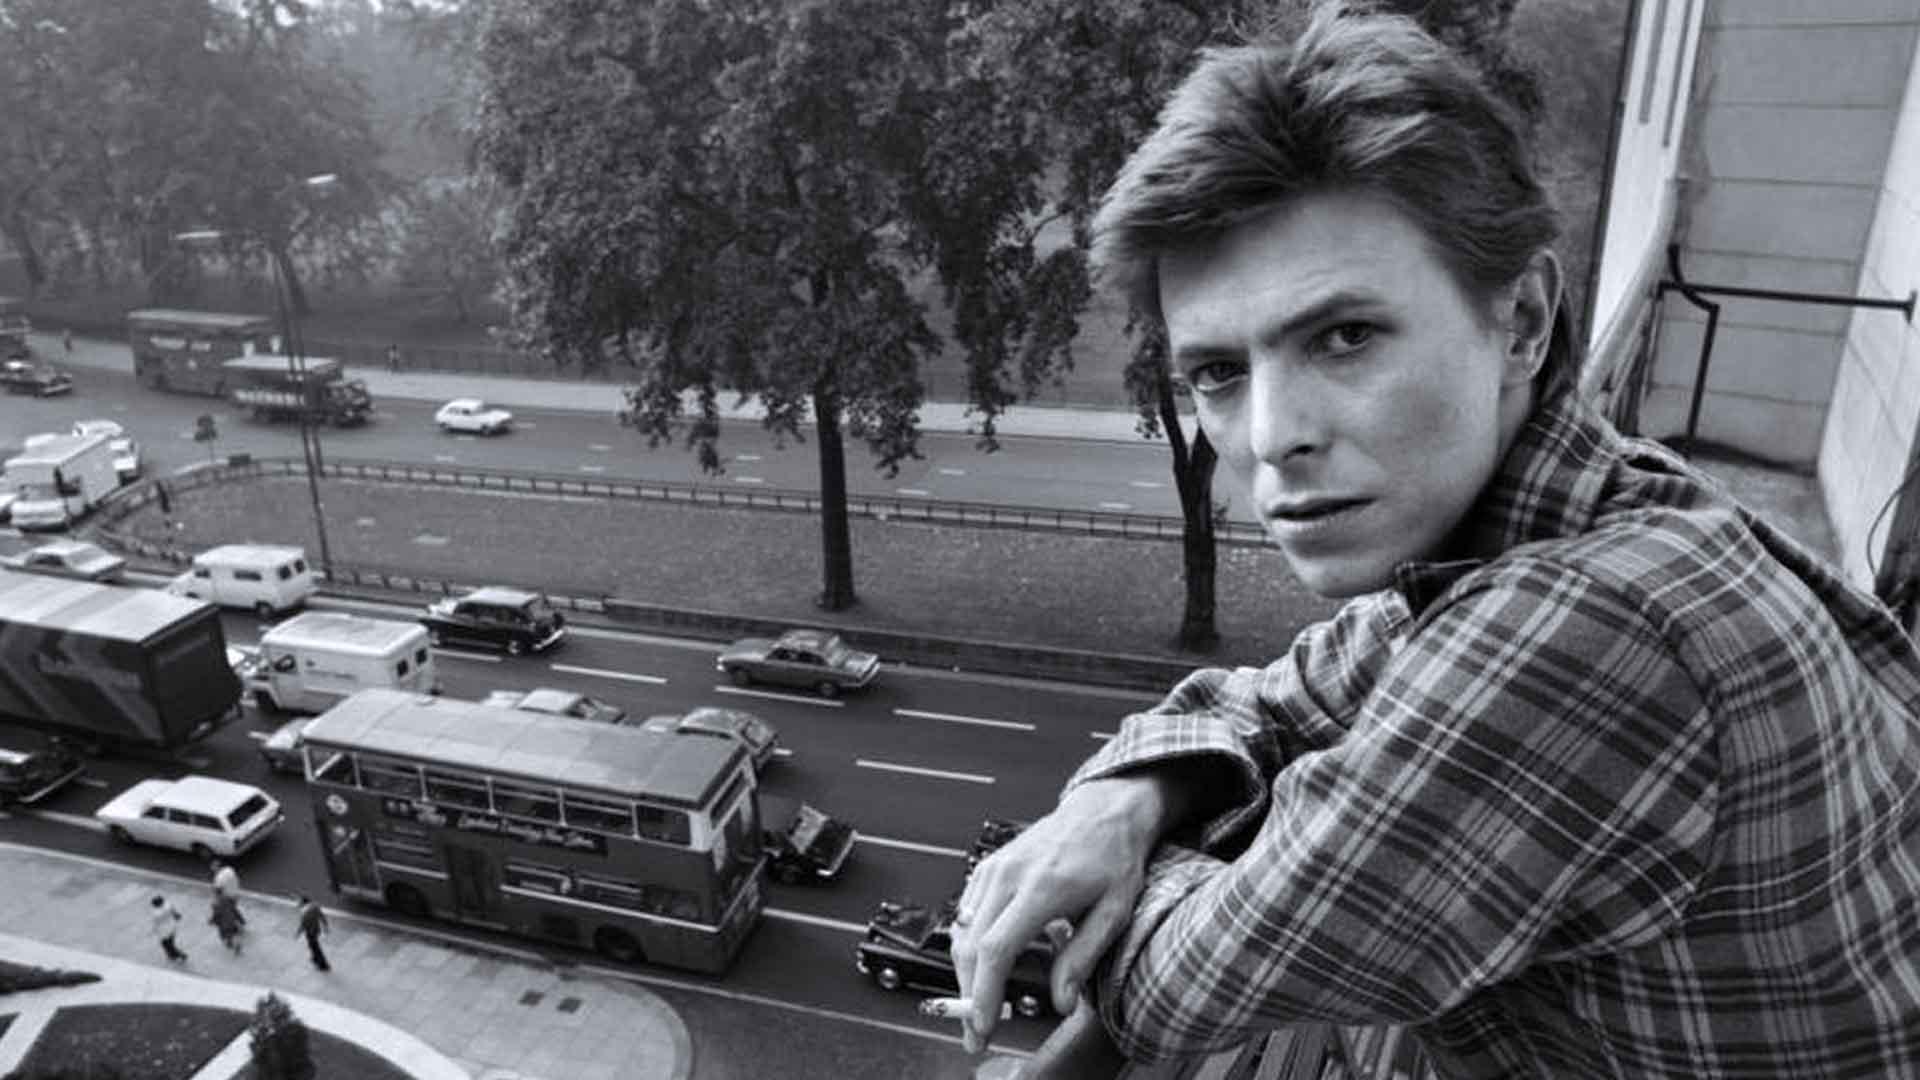 David Bowie a Berlino